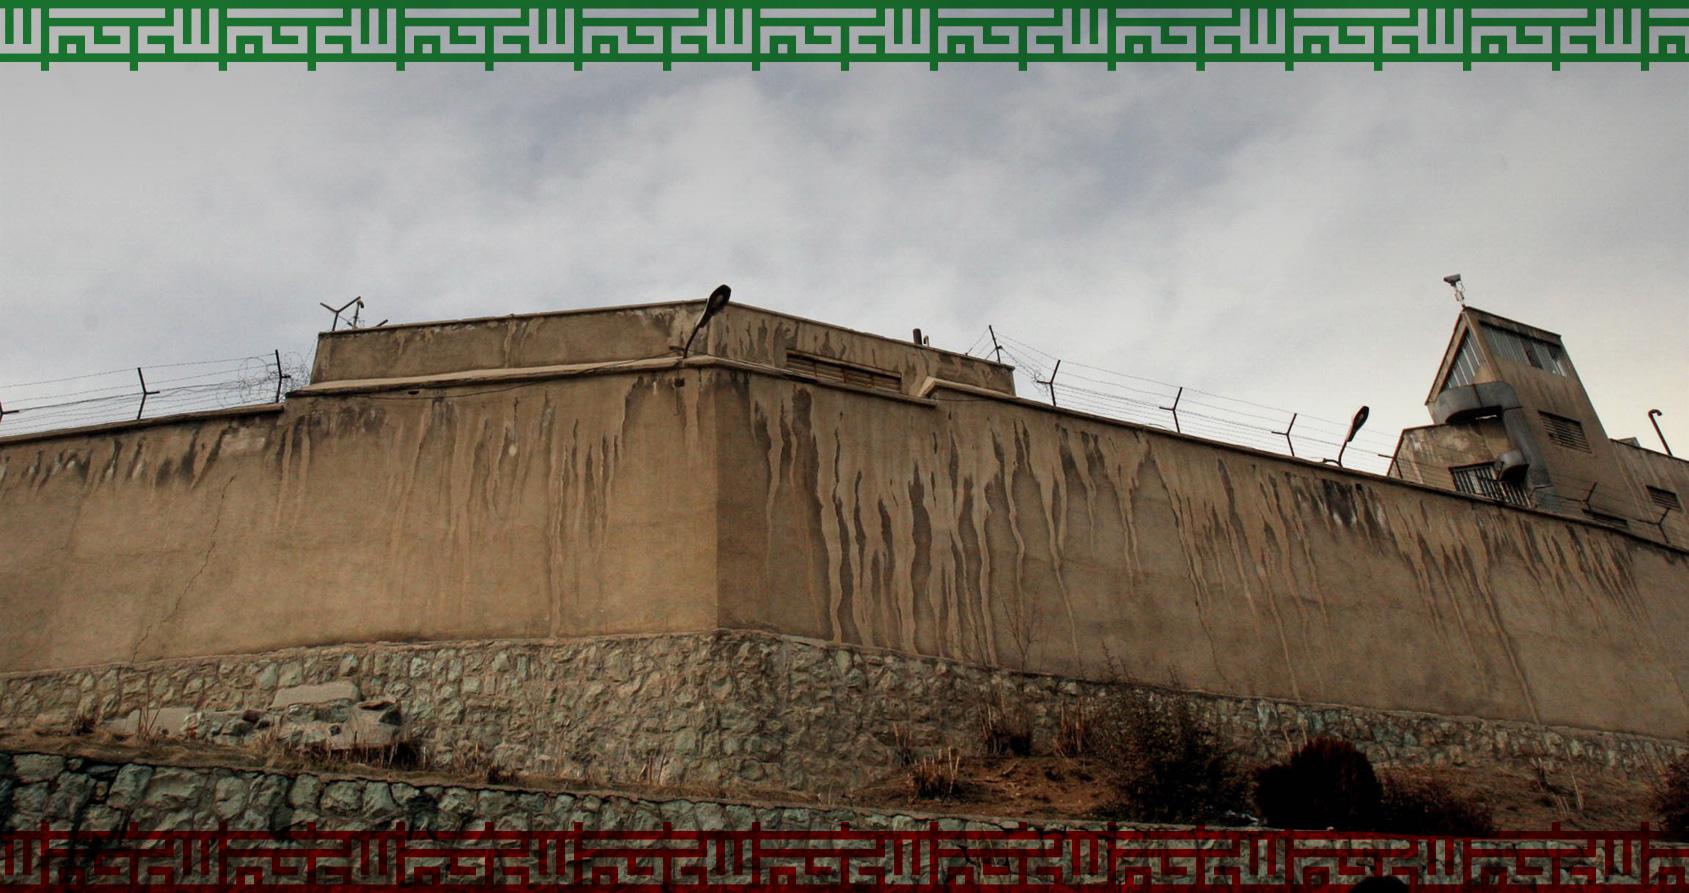 ulyces-iranrevolution-couv04